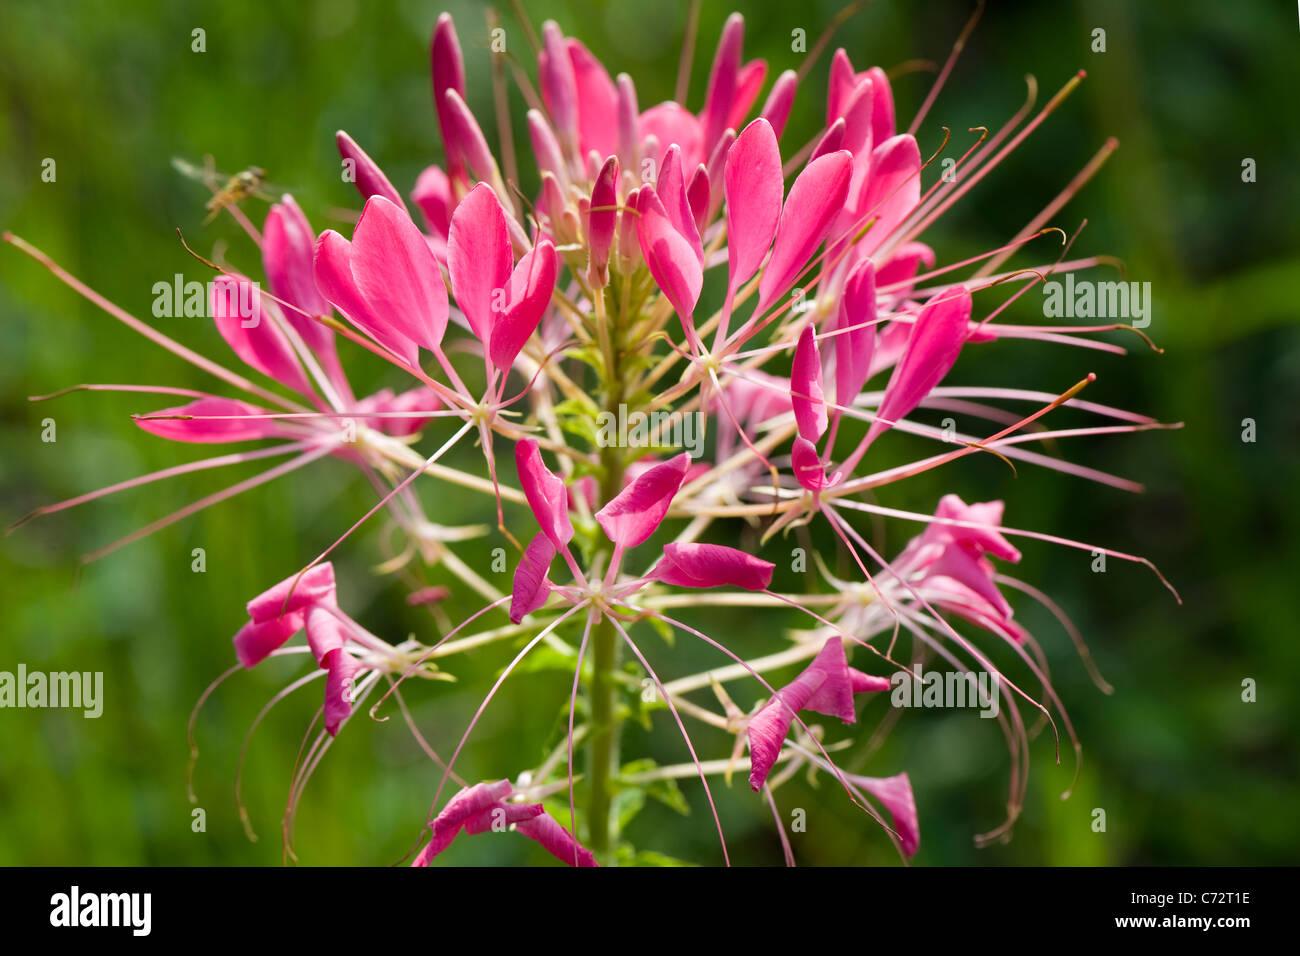 Cleome Hassleriana Pink Spider Flower Stock